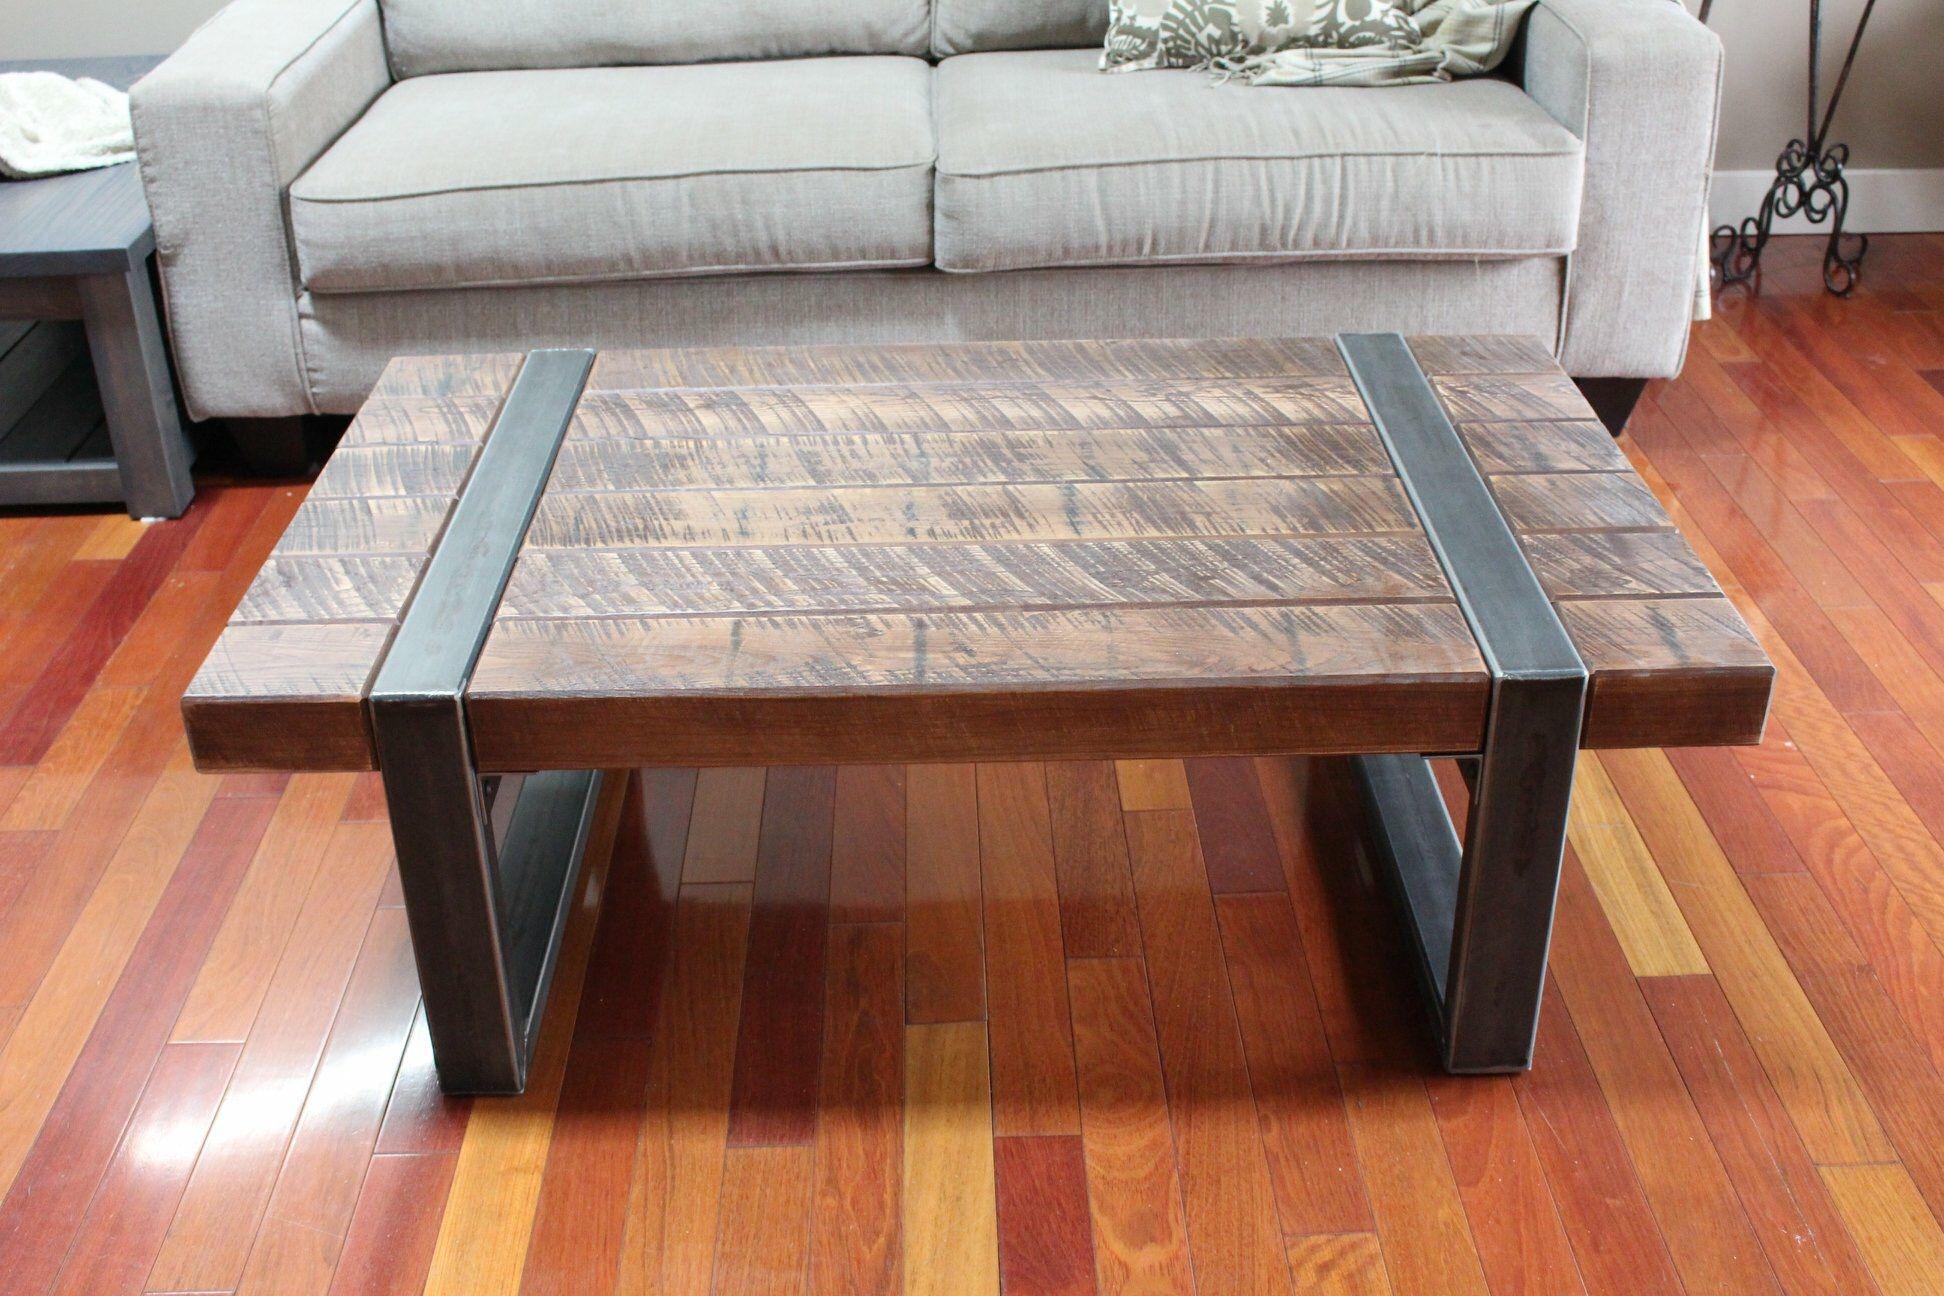 Rustic Coffee Table Rustic Industrial Coffee Table Coffee Table Wood Farmhouse Coffee Table [ 1296 x 1944 Pixel ]